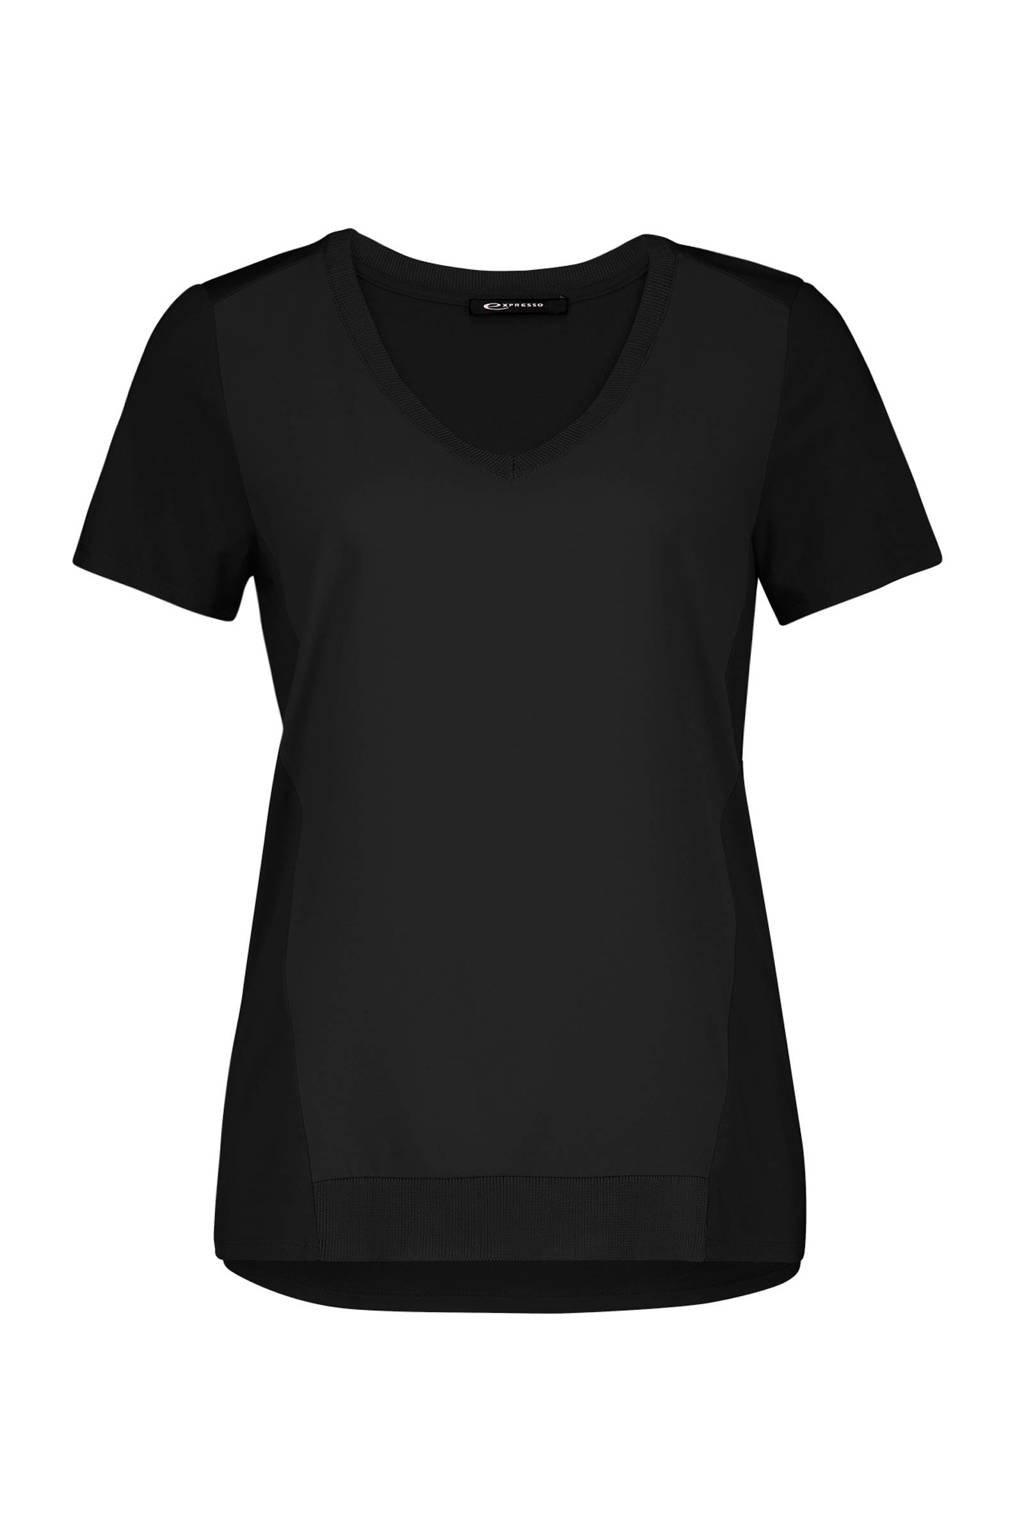 Expresso top zwart, Zwart